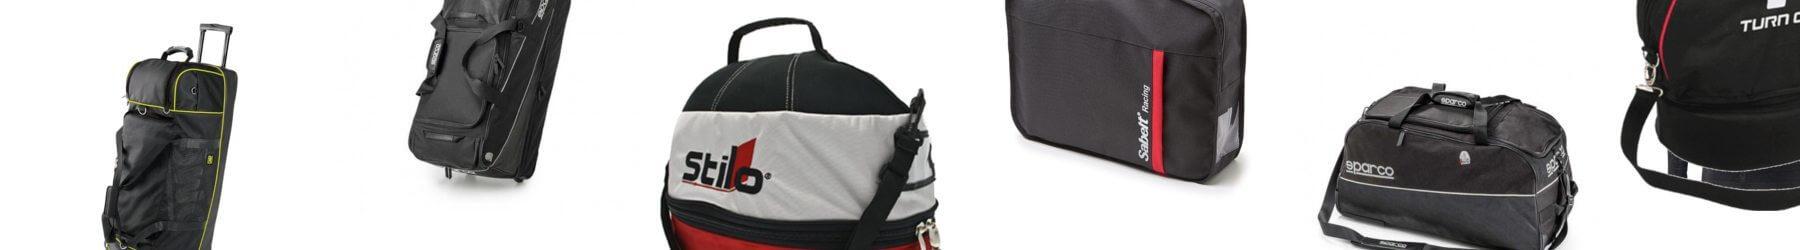 Motorsport Kit Bags